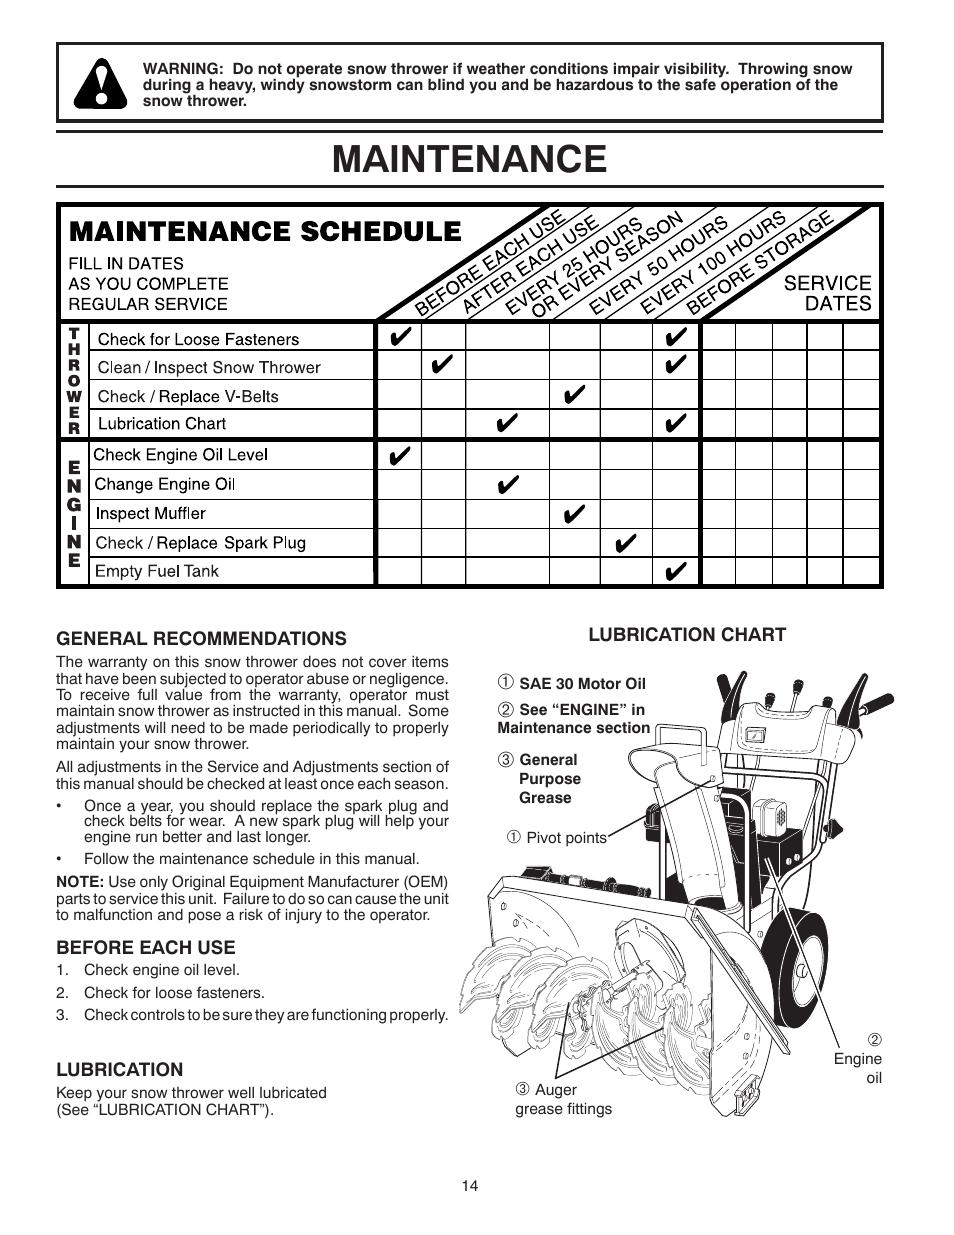 Maintenance | Husqvarna 14527SB-LS User Manual | Page 14 / 24